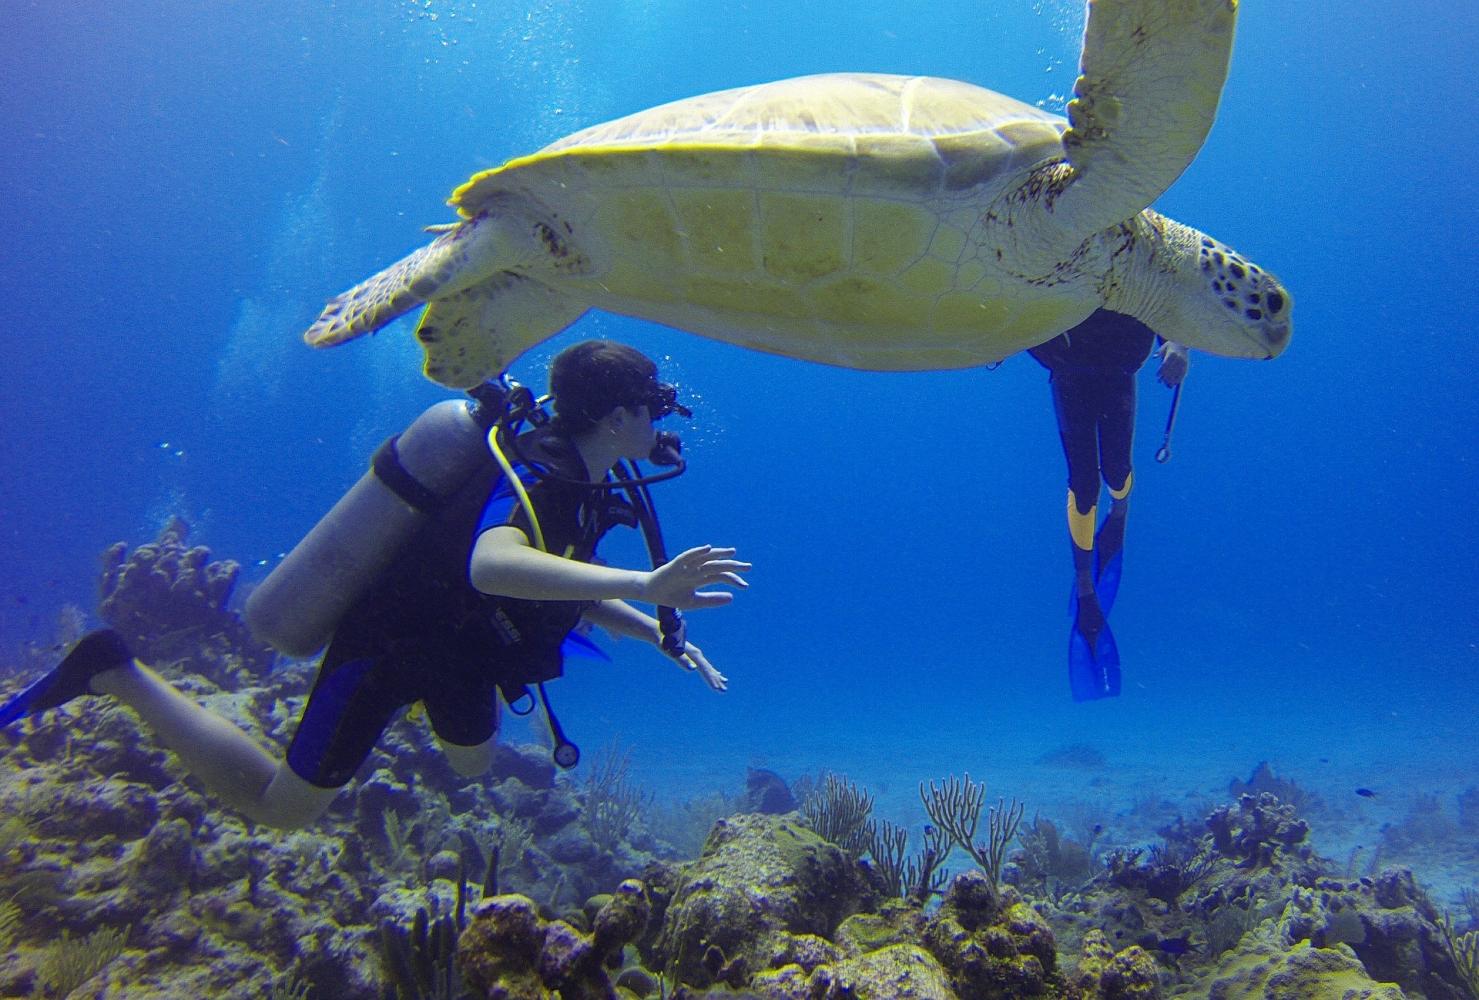 Najbolje plaže prema horoskopu, Meksiko, ronjenje